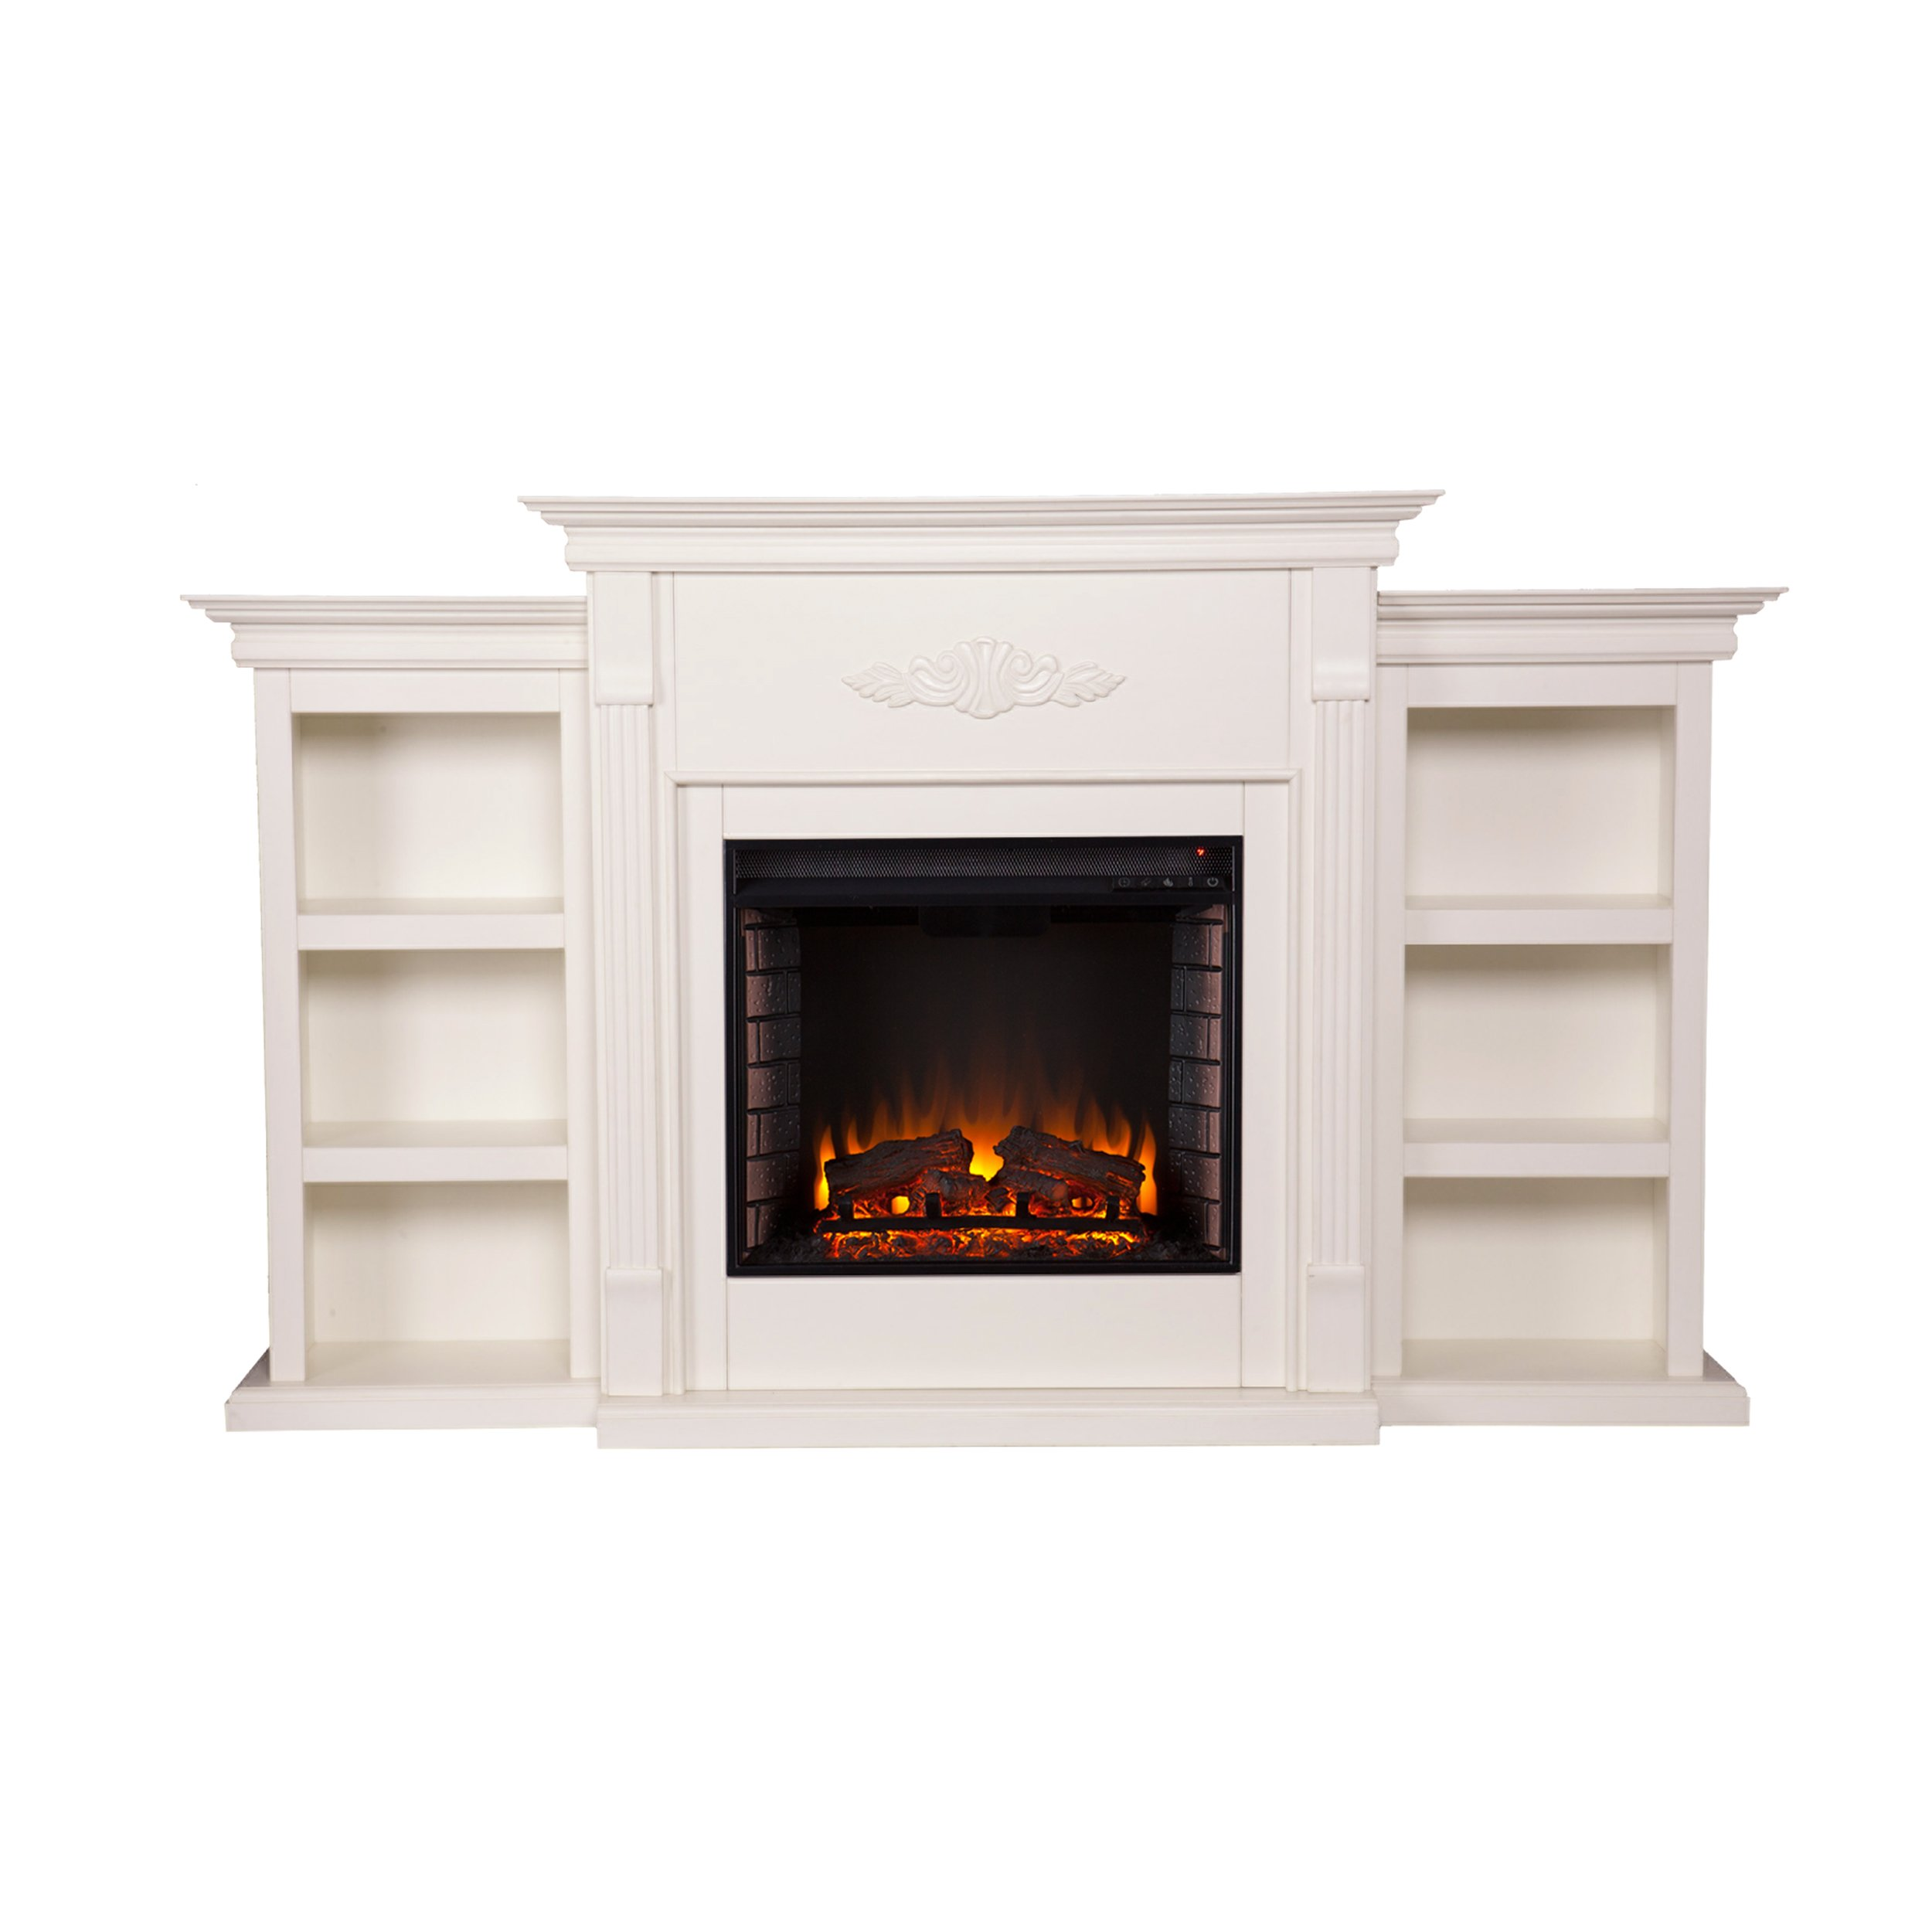 fireplace bookshelf amazon com rh amazon com Dimplex Electric Fireplace Insert Dimplex Linear Electric Fireplace